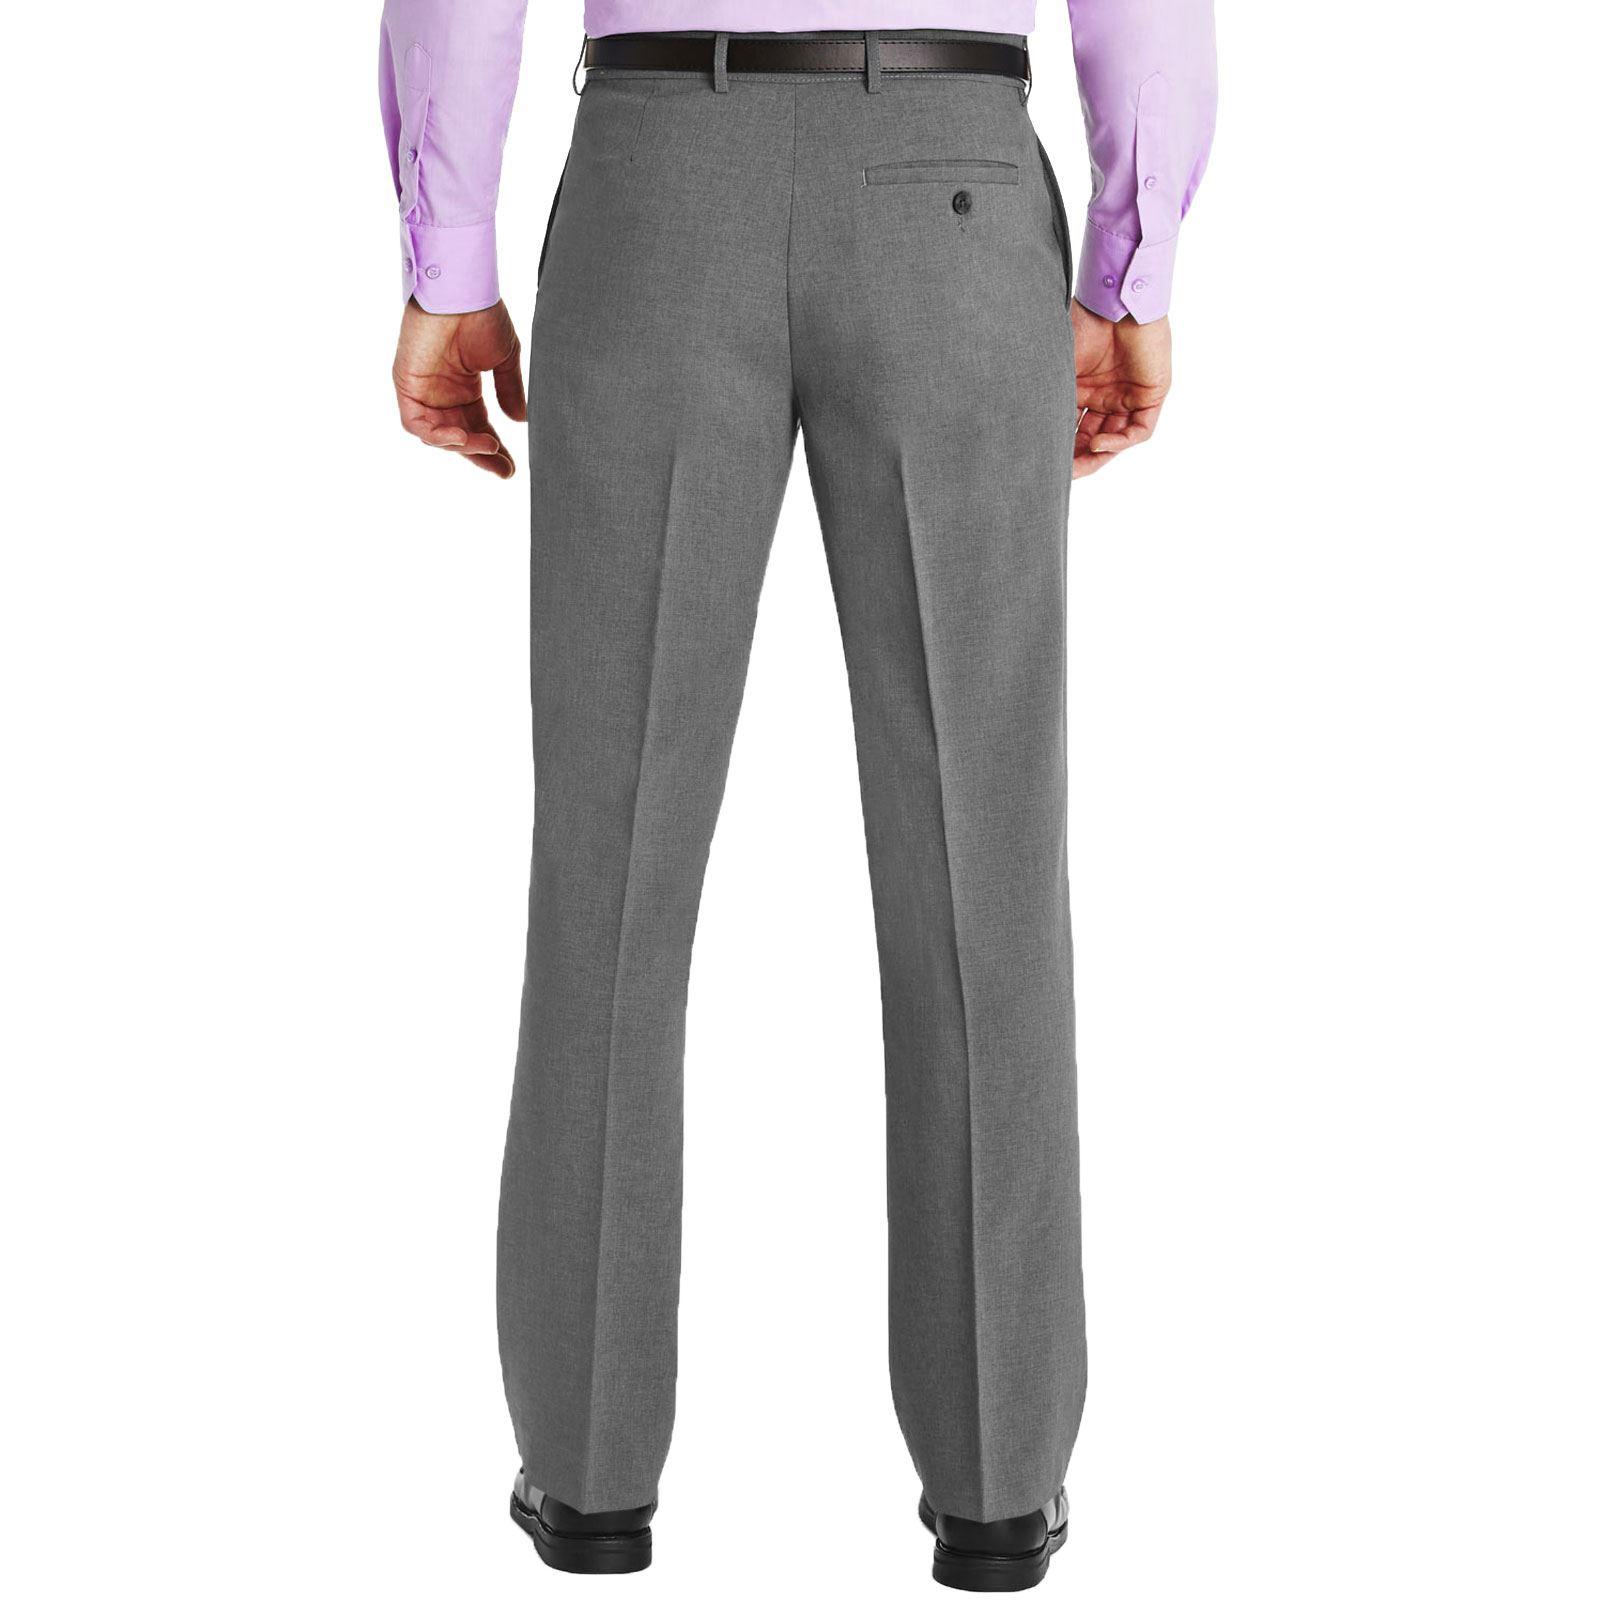 Mens Trousers Formal Office Work Smart School Uniform Belted Big